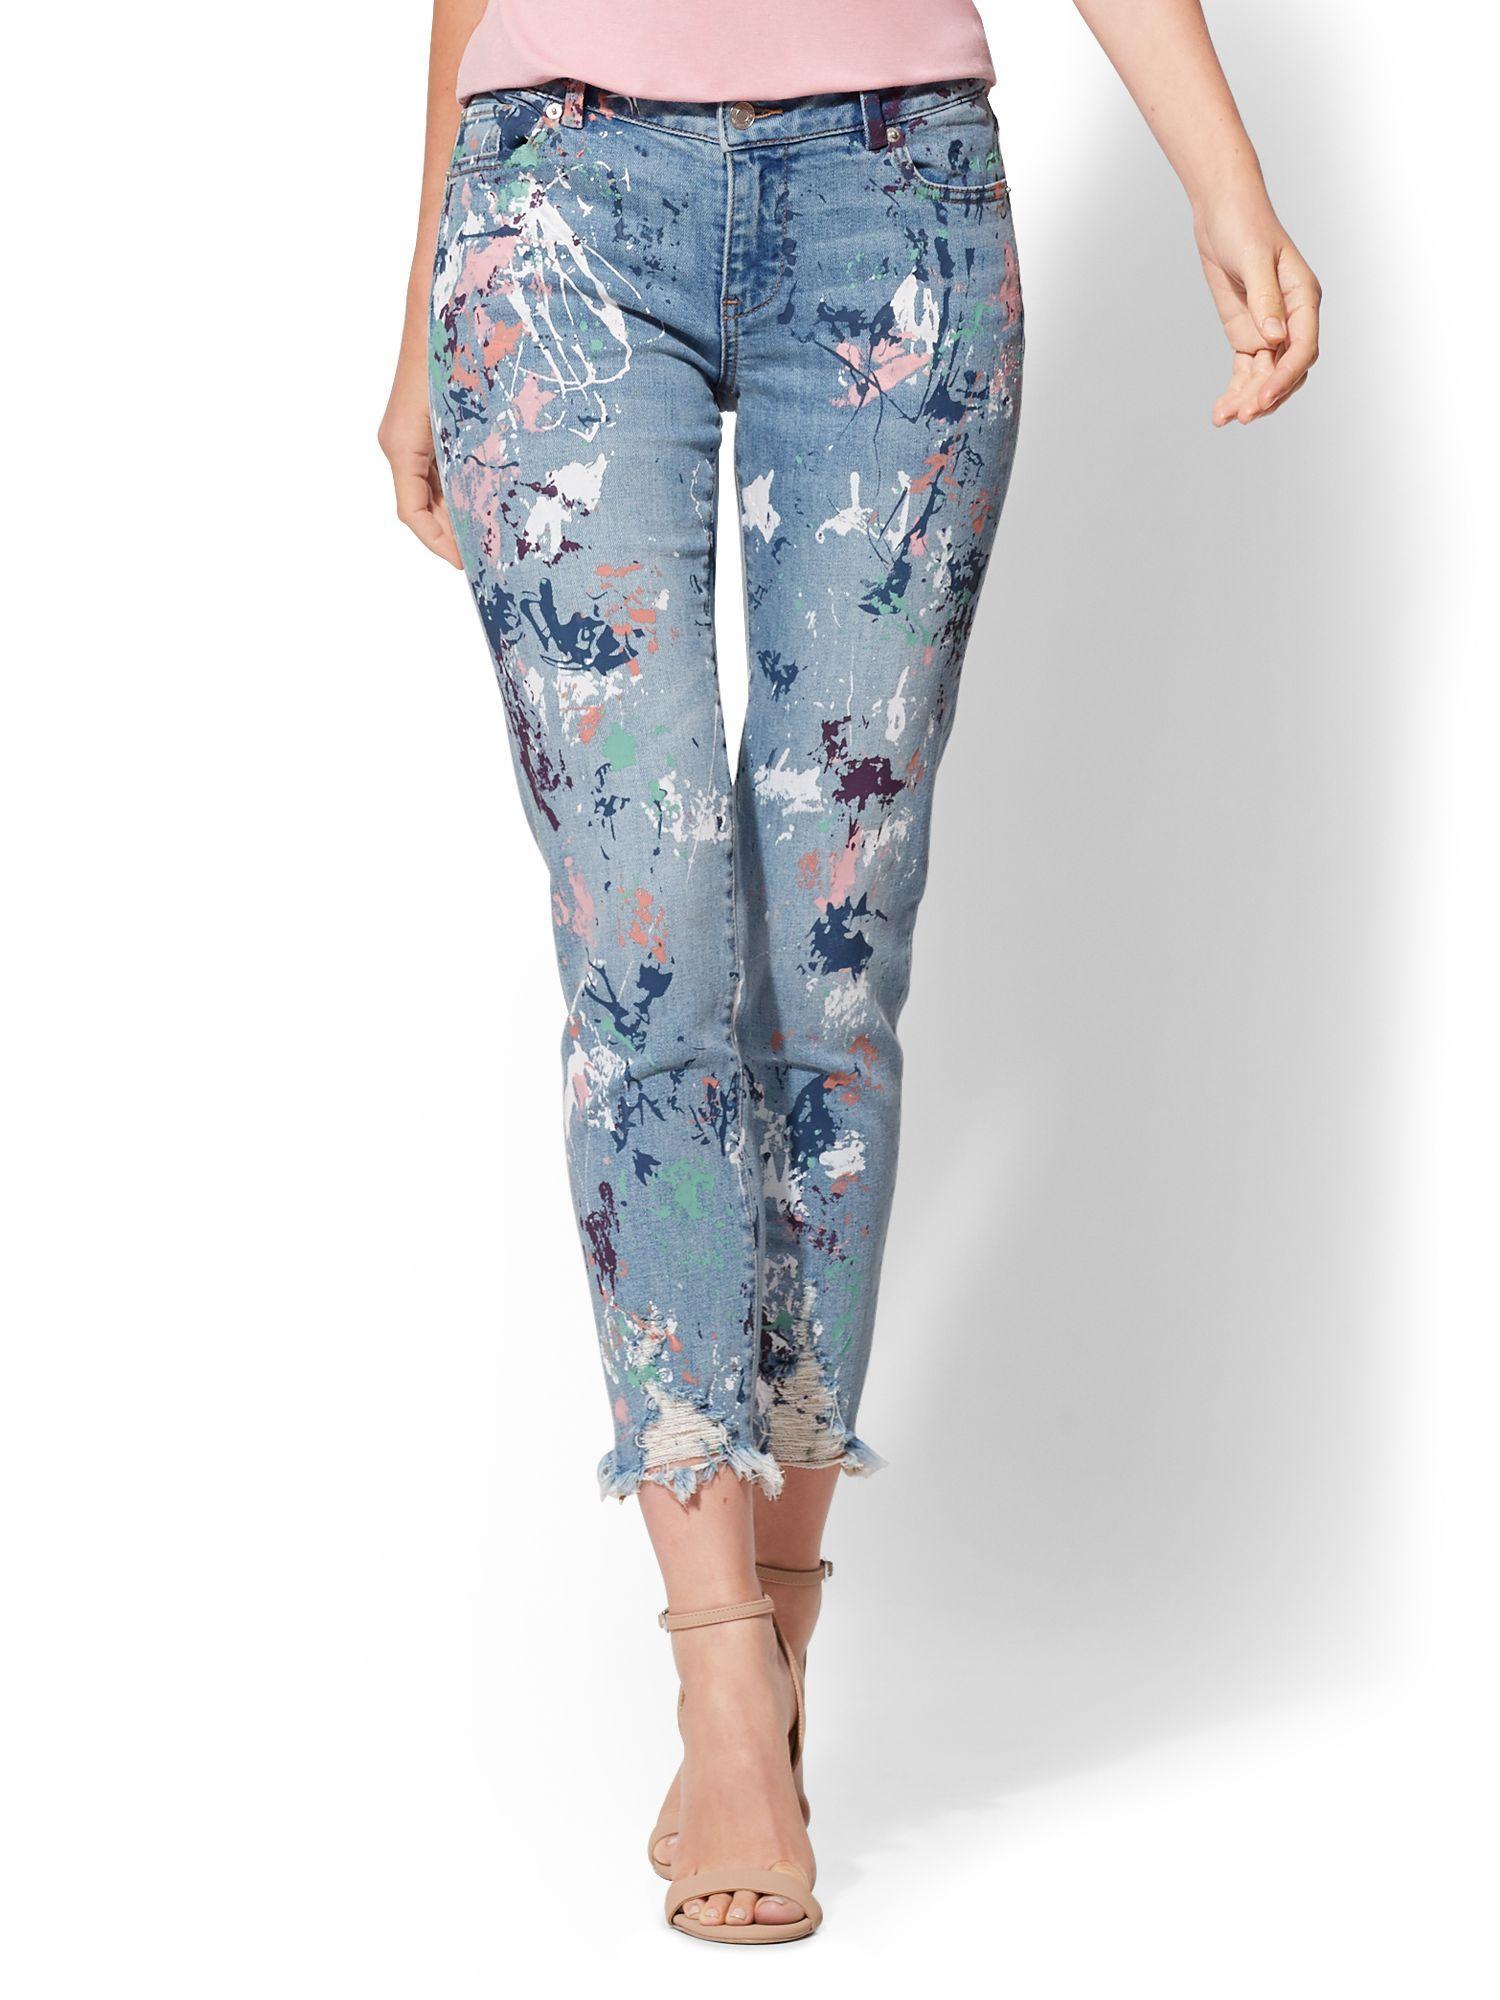 51a7db5a3cd7 New York   Company. Women s Blue Destroyed Paint-splattered Boyfriend Jeans  - Soho Jeans